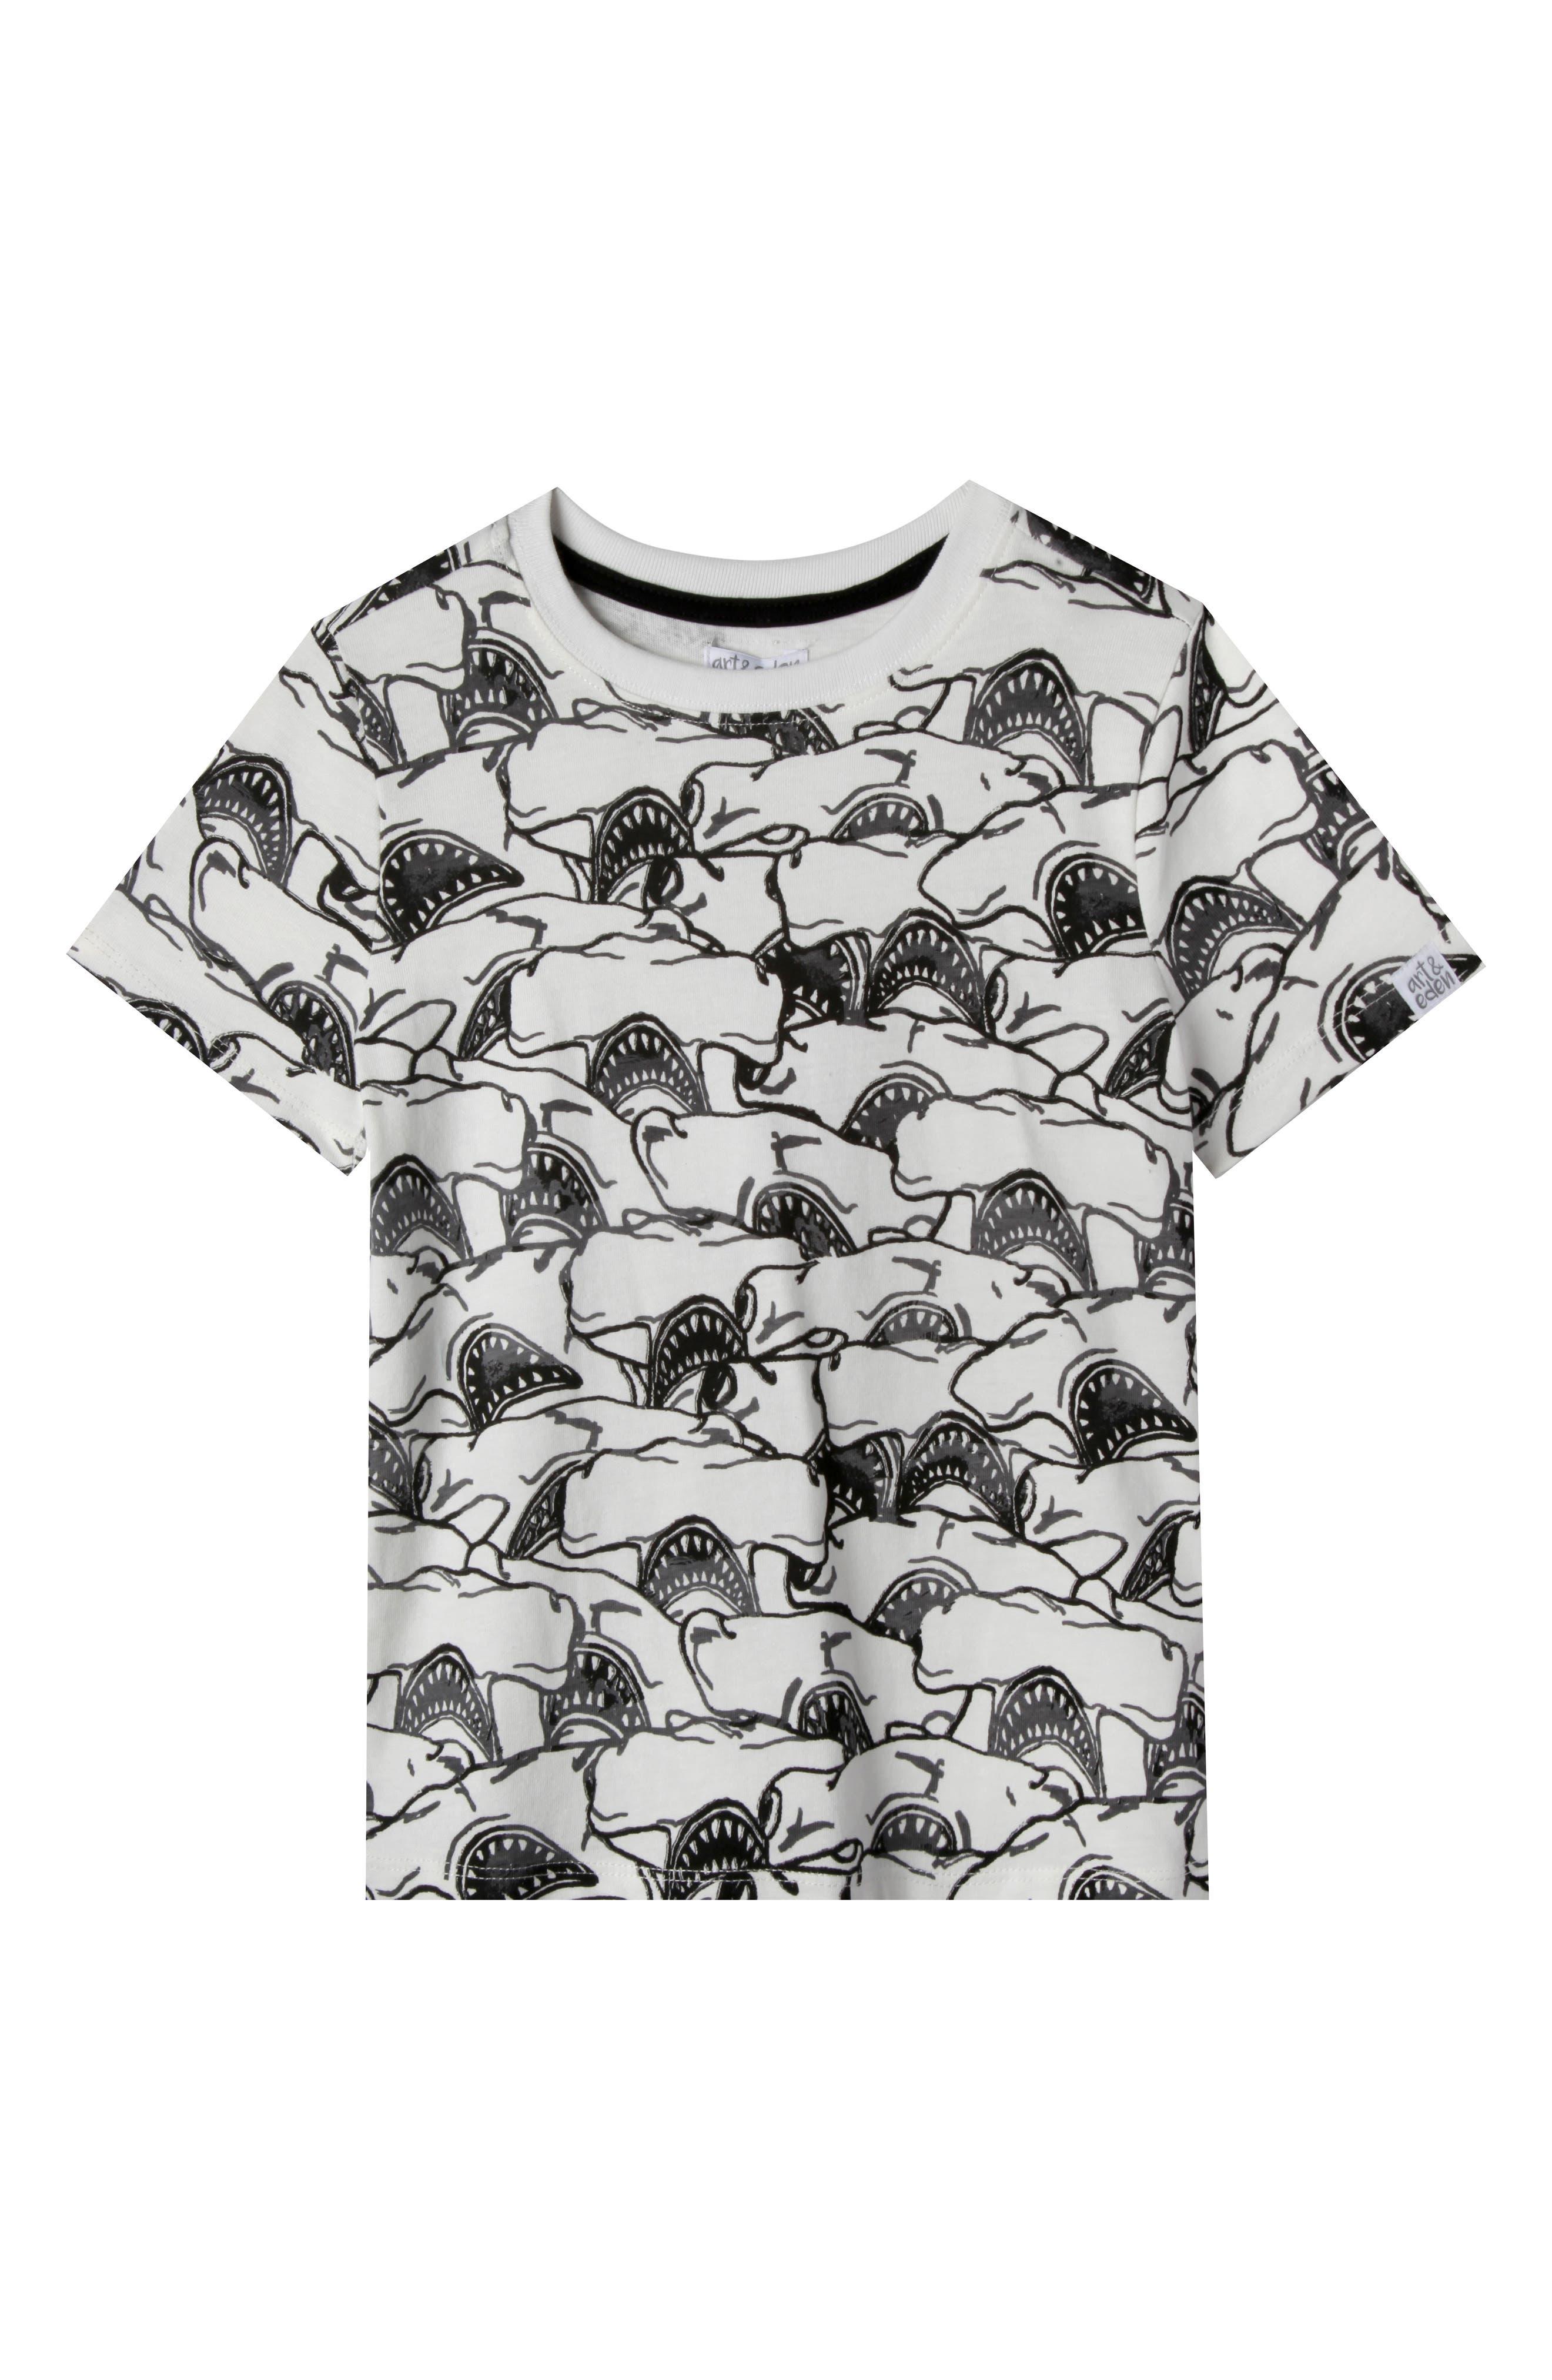 Henry Organic Cotton T-Shirt,                             Main thumbnail 1, color,                             Black